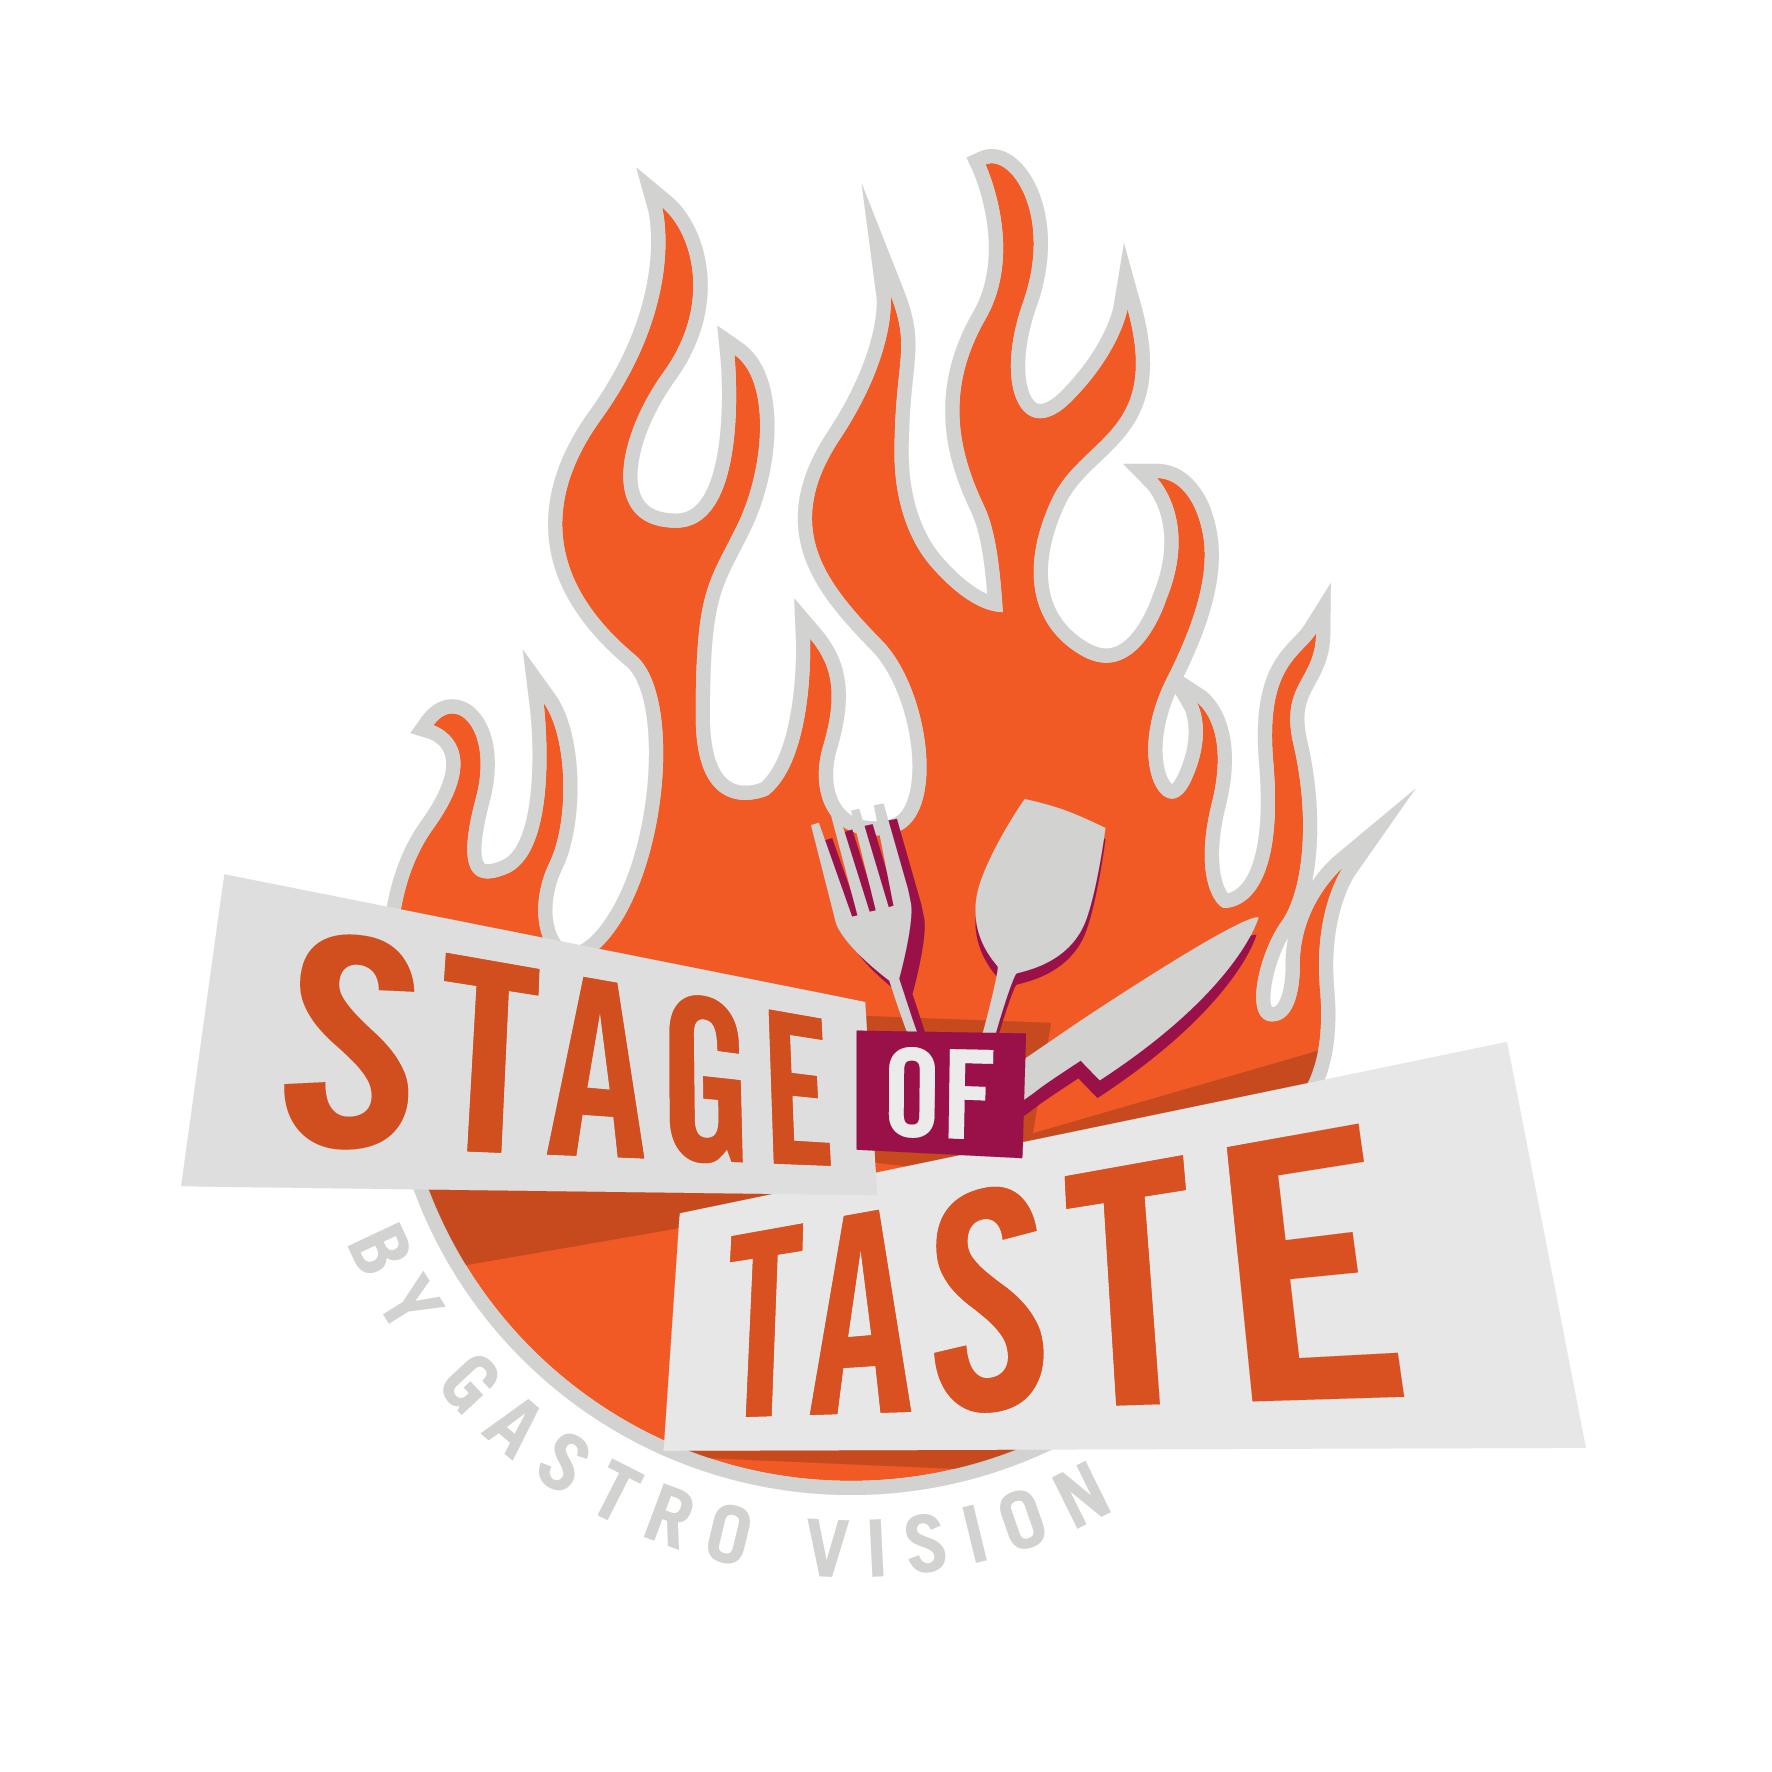 Stage of Taste